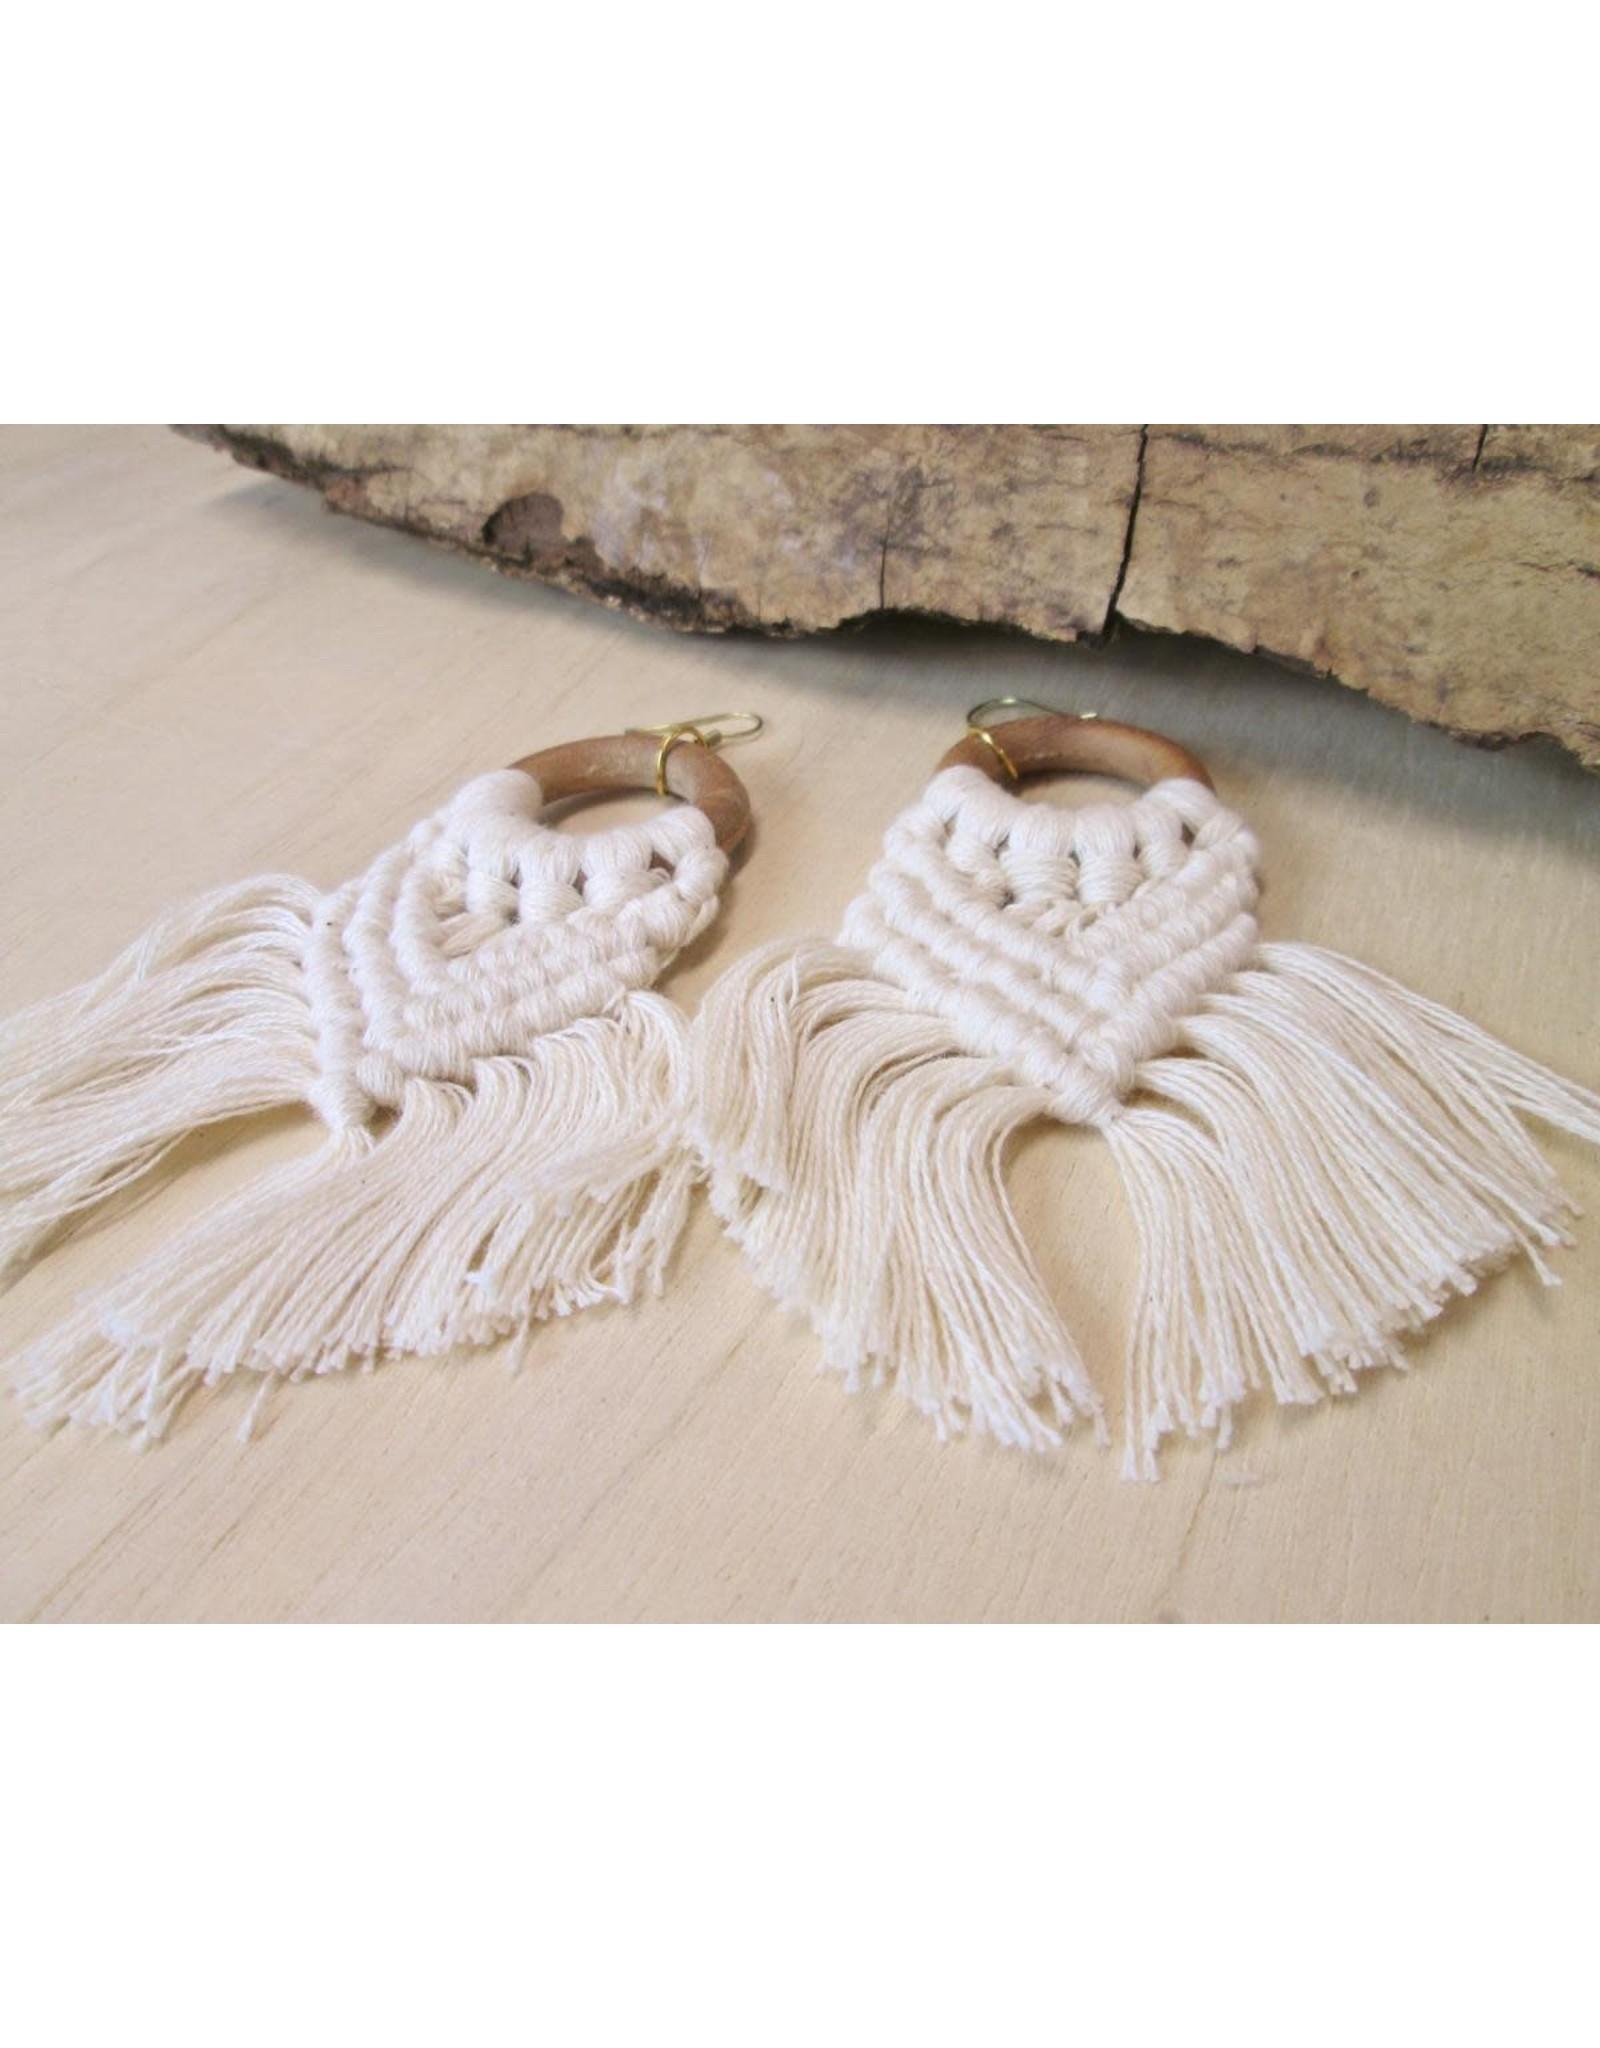 Bali Queen Wood Ring Macrame Earrings